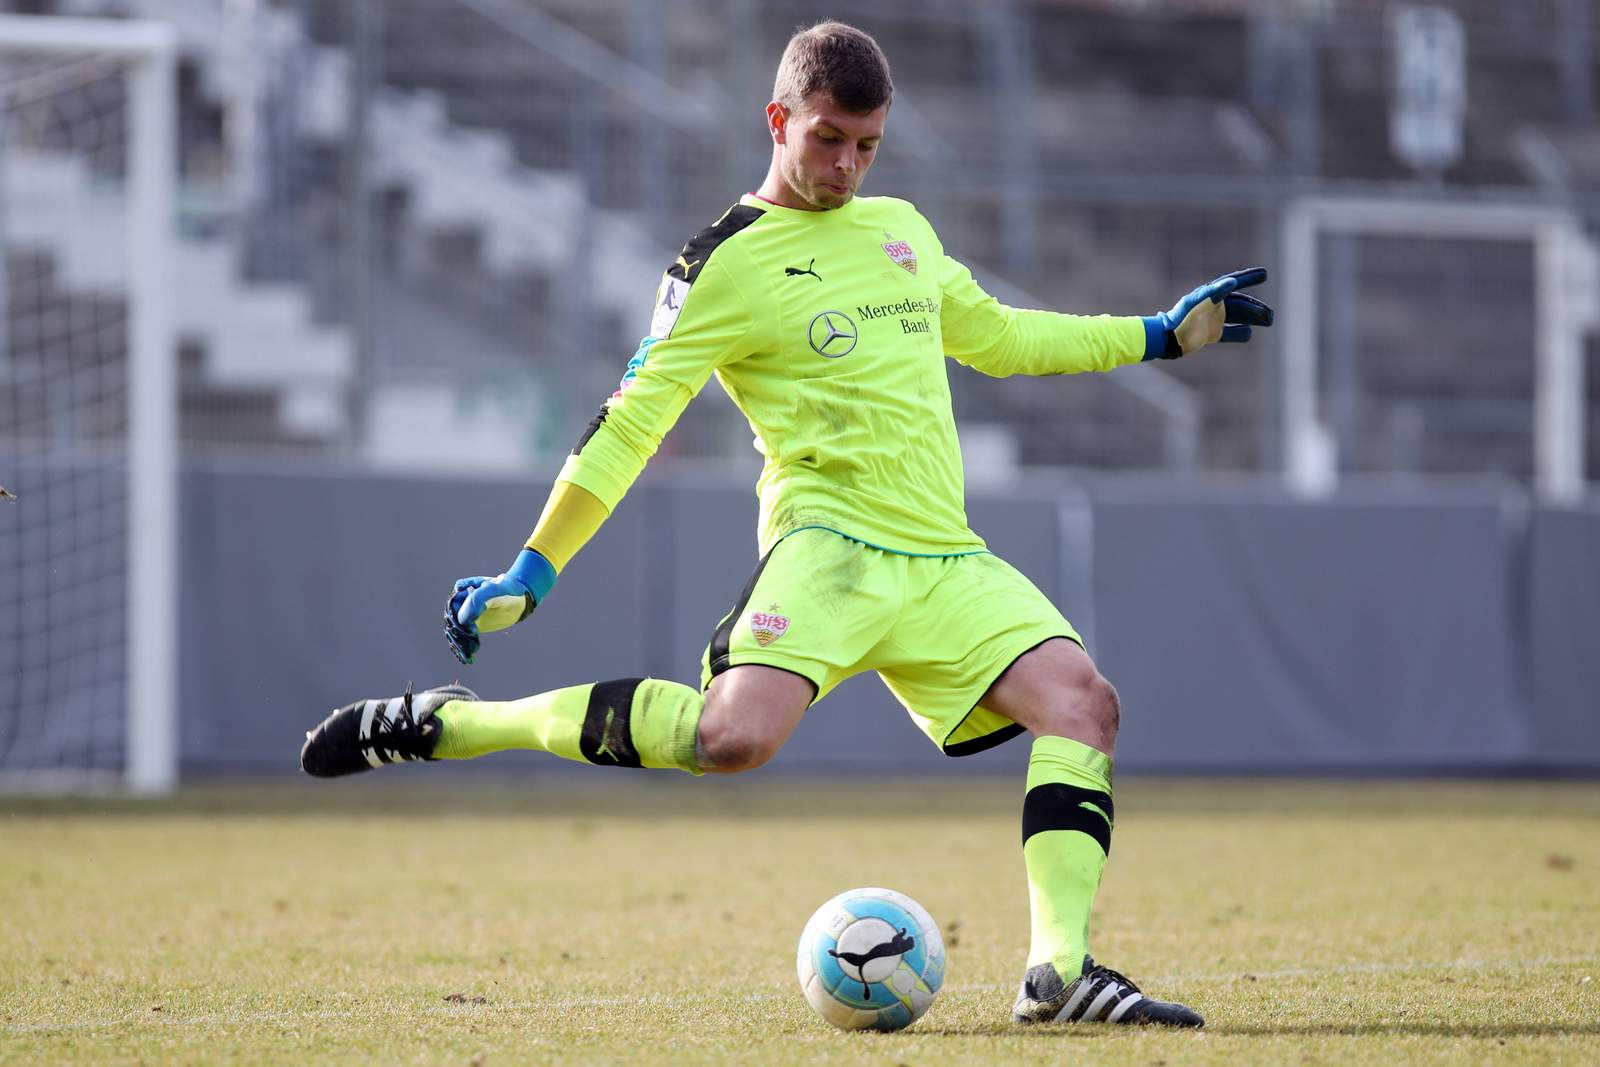 Meister erhält beim KSC langfristigen Vertrag - VfB-Torhüter kommt